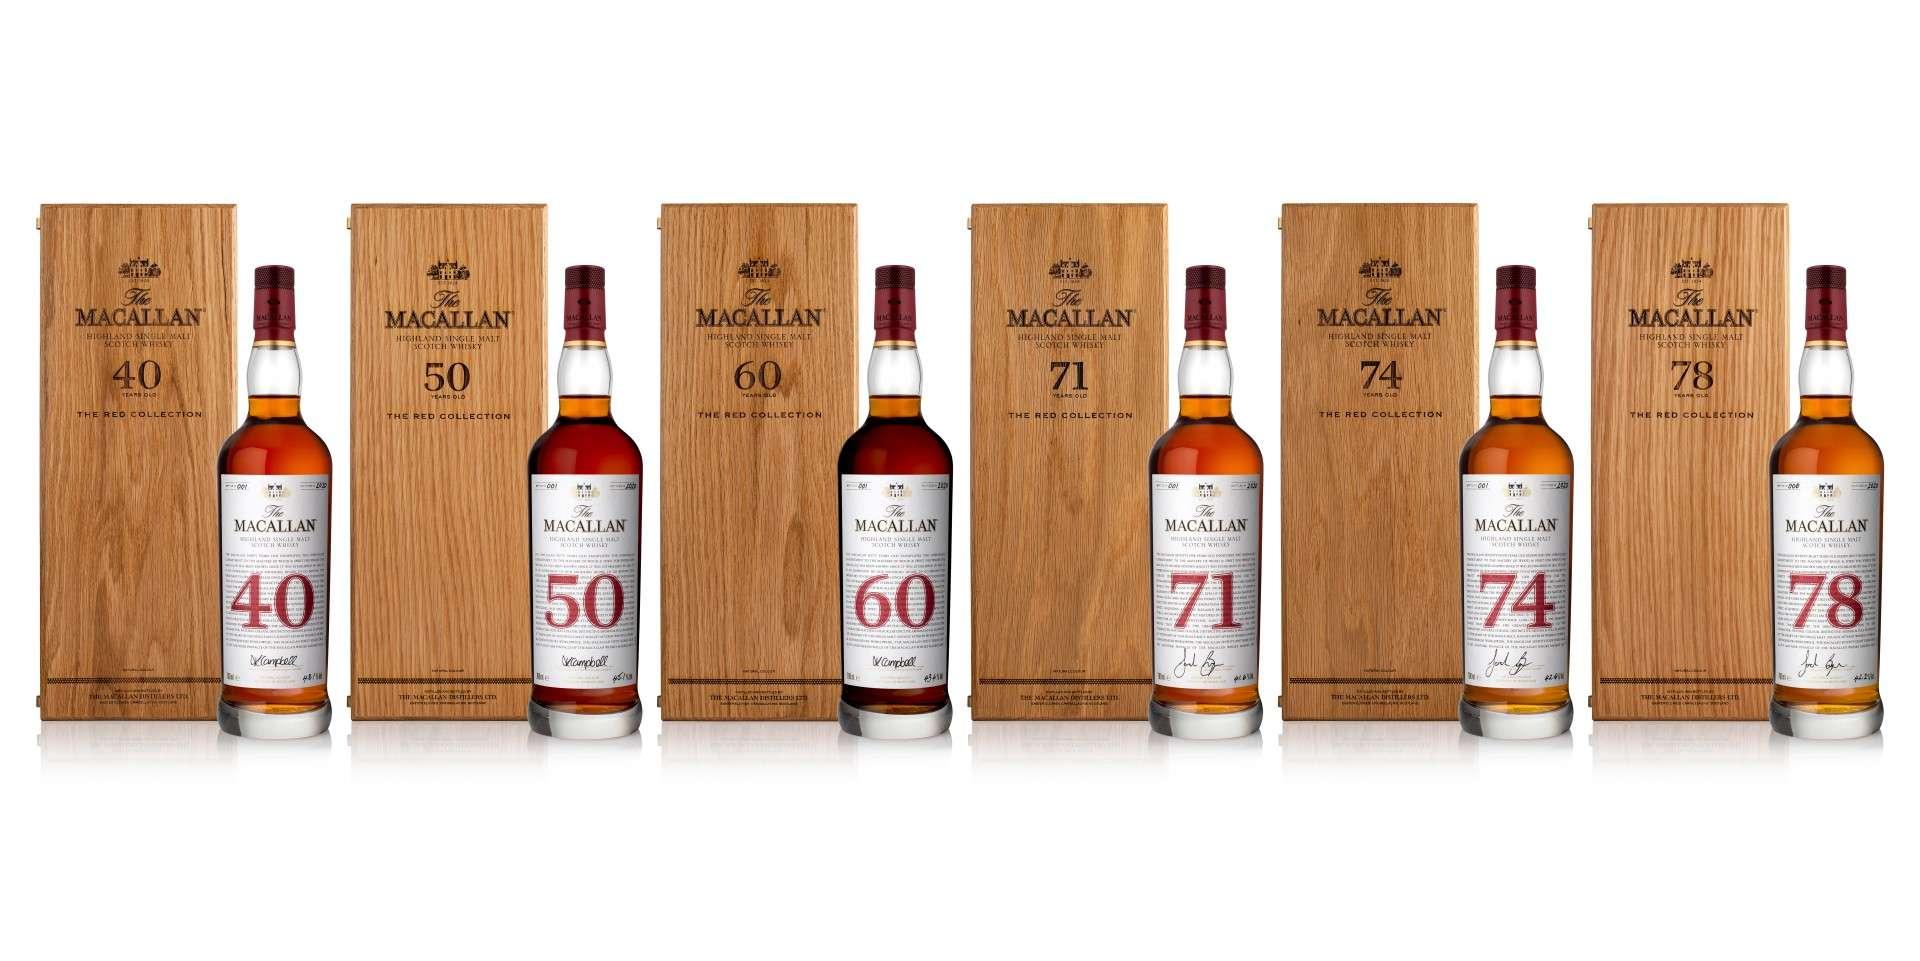 威士忌夢幻逸品:麥卡倫 MACALLAN RED COLLECTION